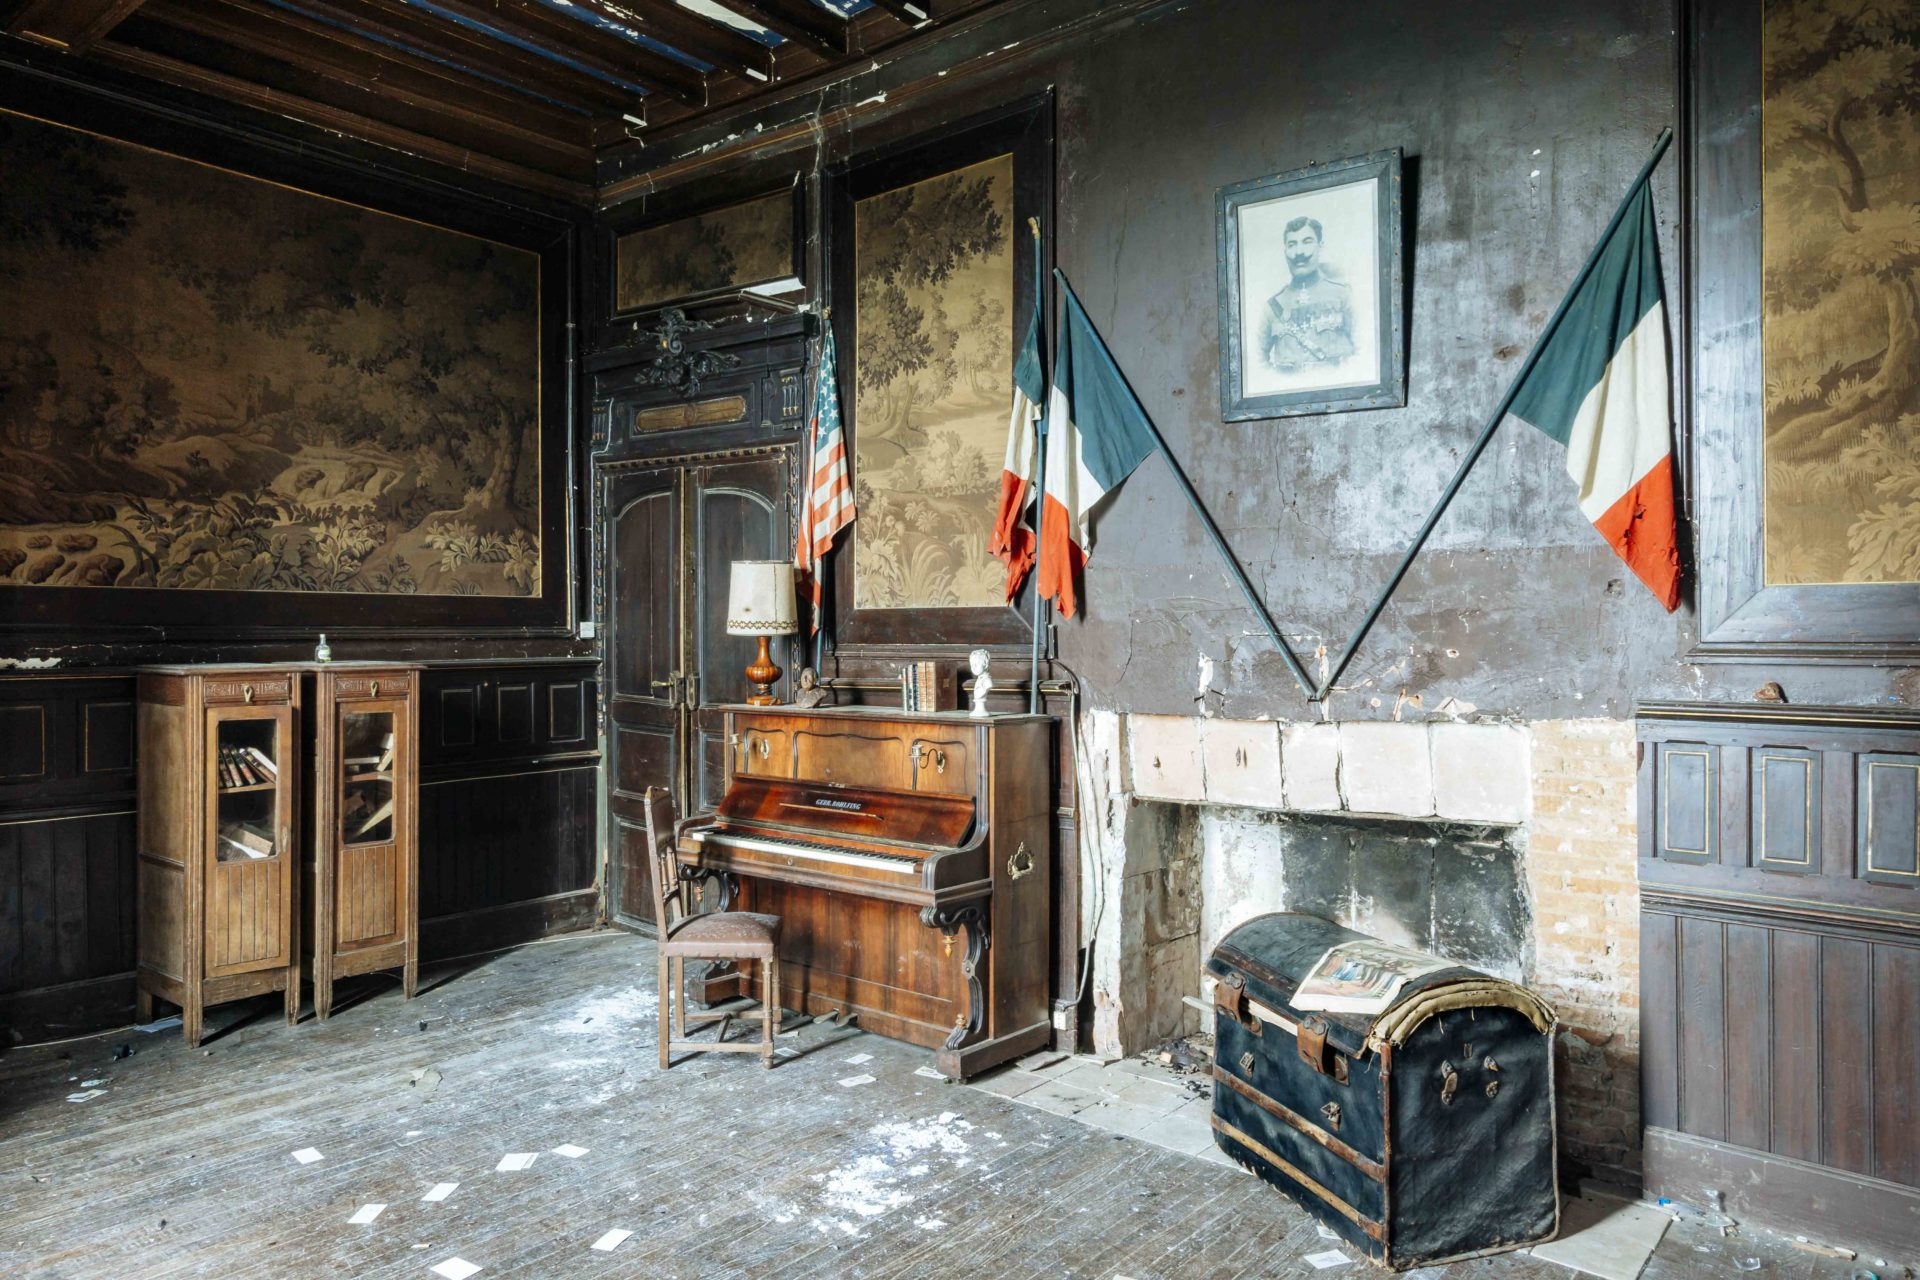 Requiem pour pianos 42 | Serie Requiem pour pianos | Romain Thiery | France